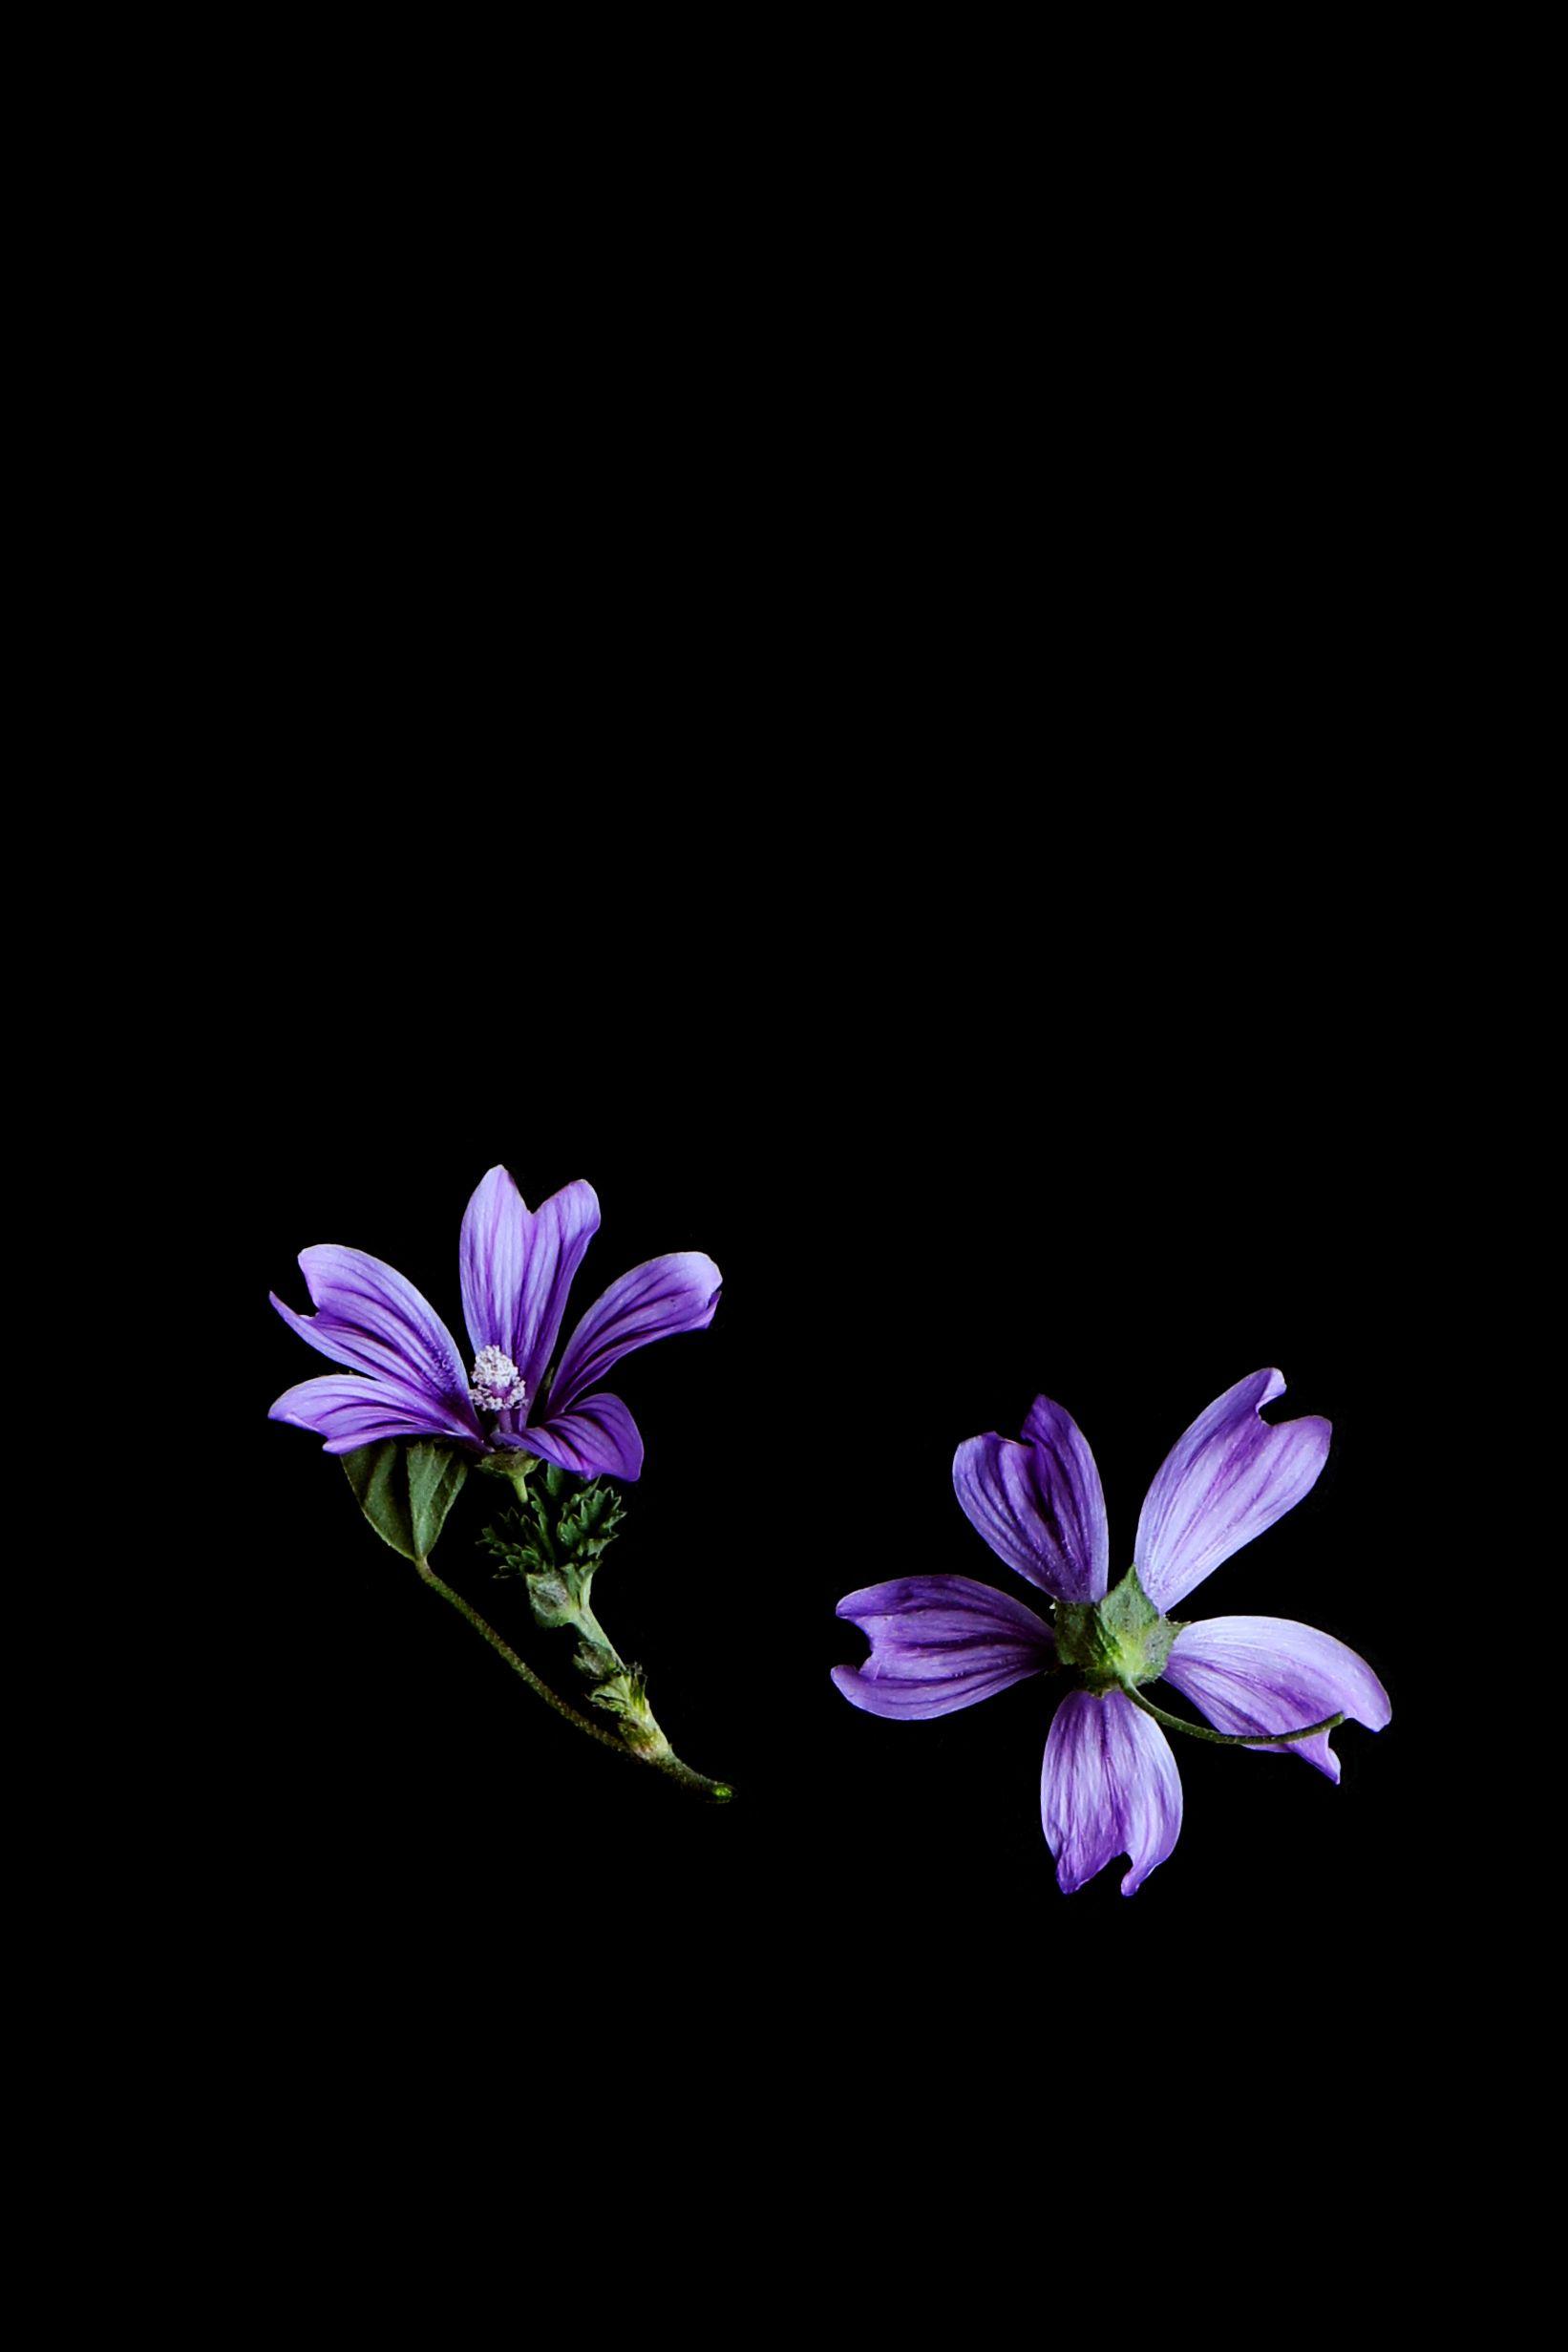 Mauve Still Mary Jo Hoffman Dark Flowers Purple Flowers Wallpaper Black Background Wallpaper